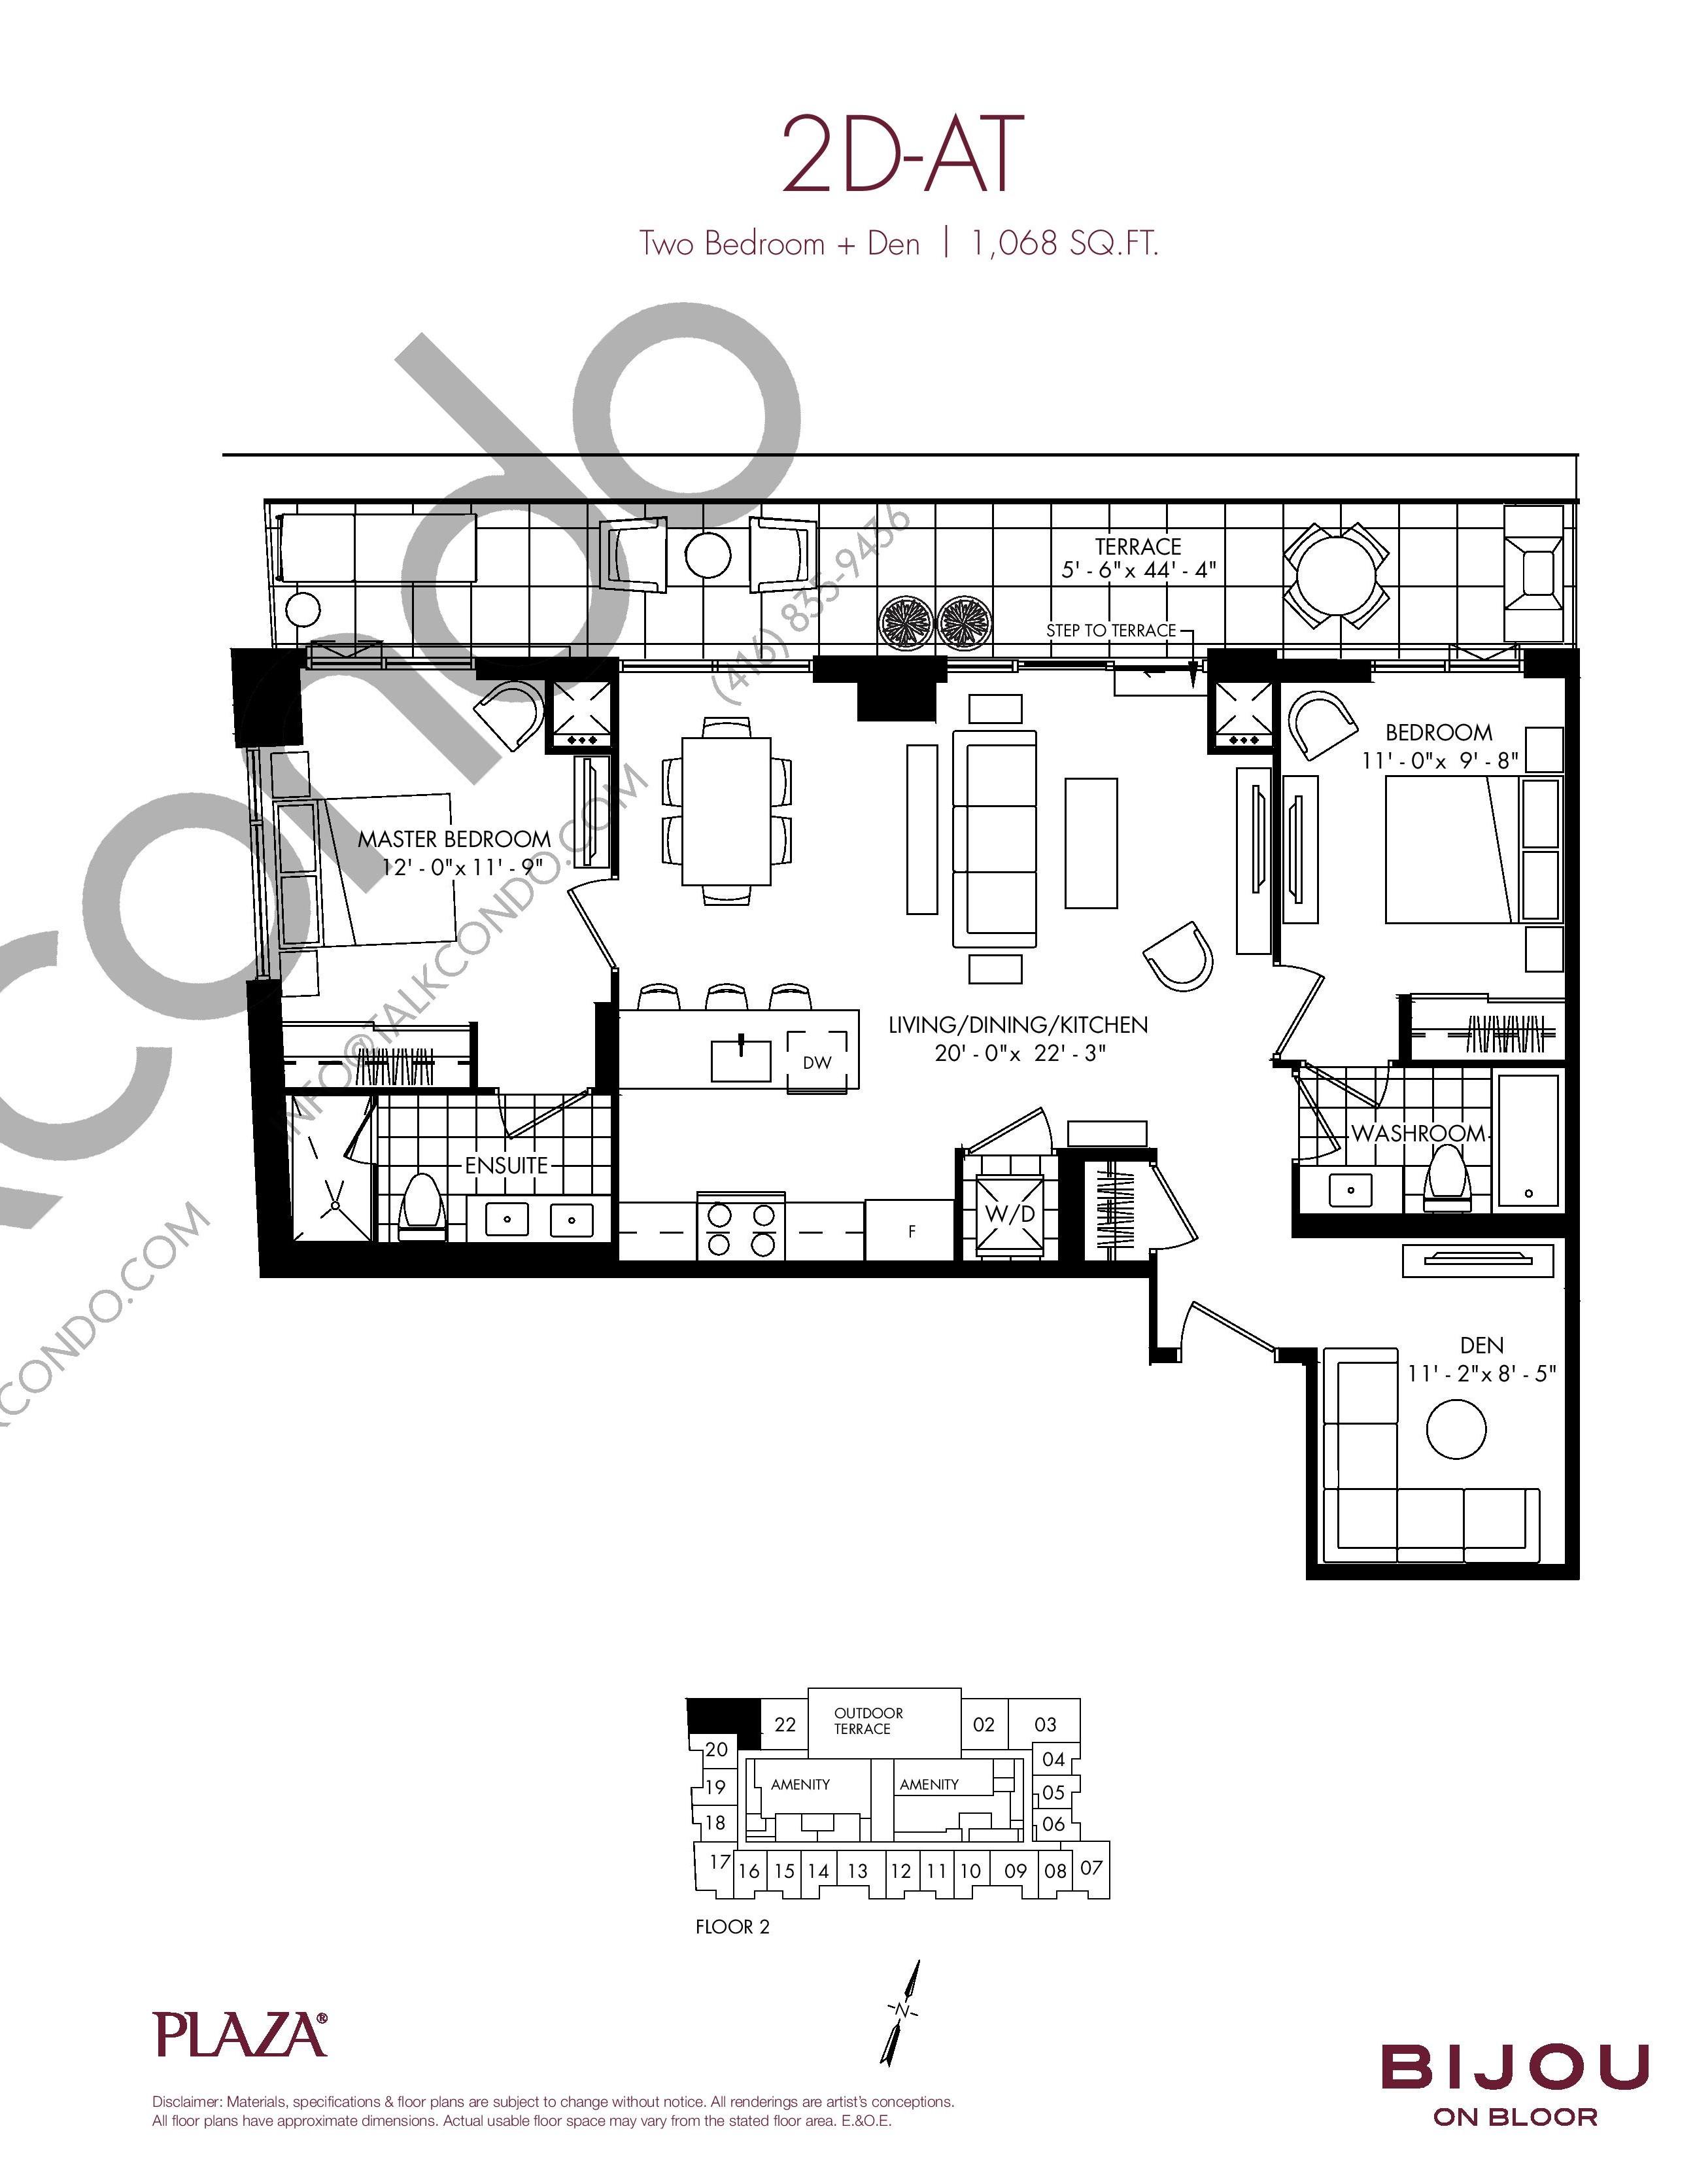 2D-AT Floor Plan at Bijou On Bloor Condos - 1068 sq.ft